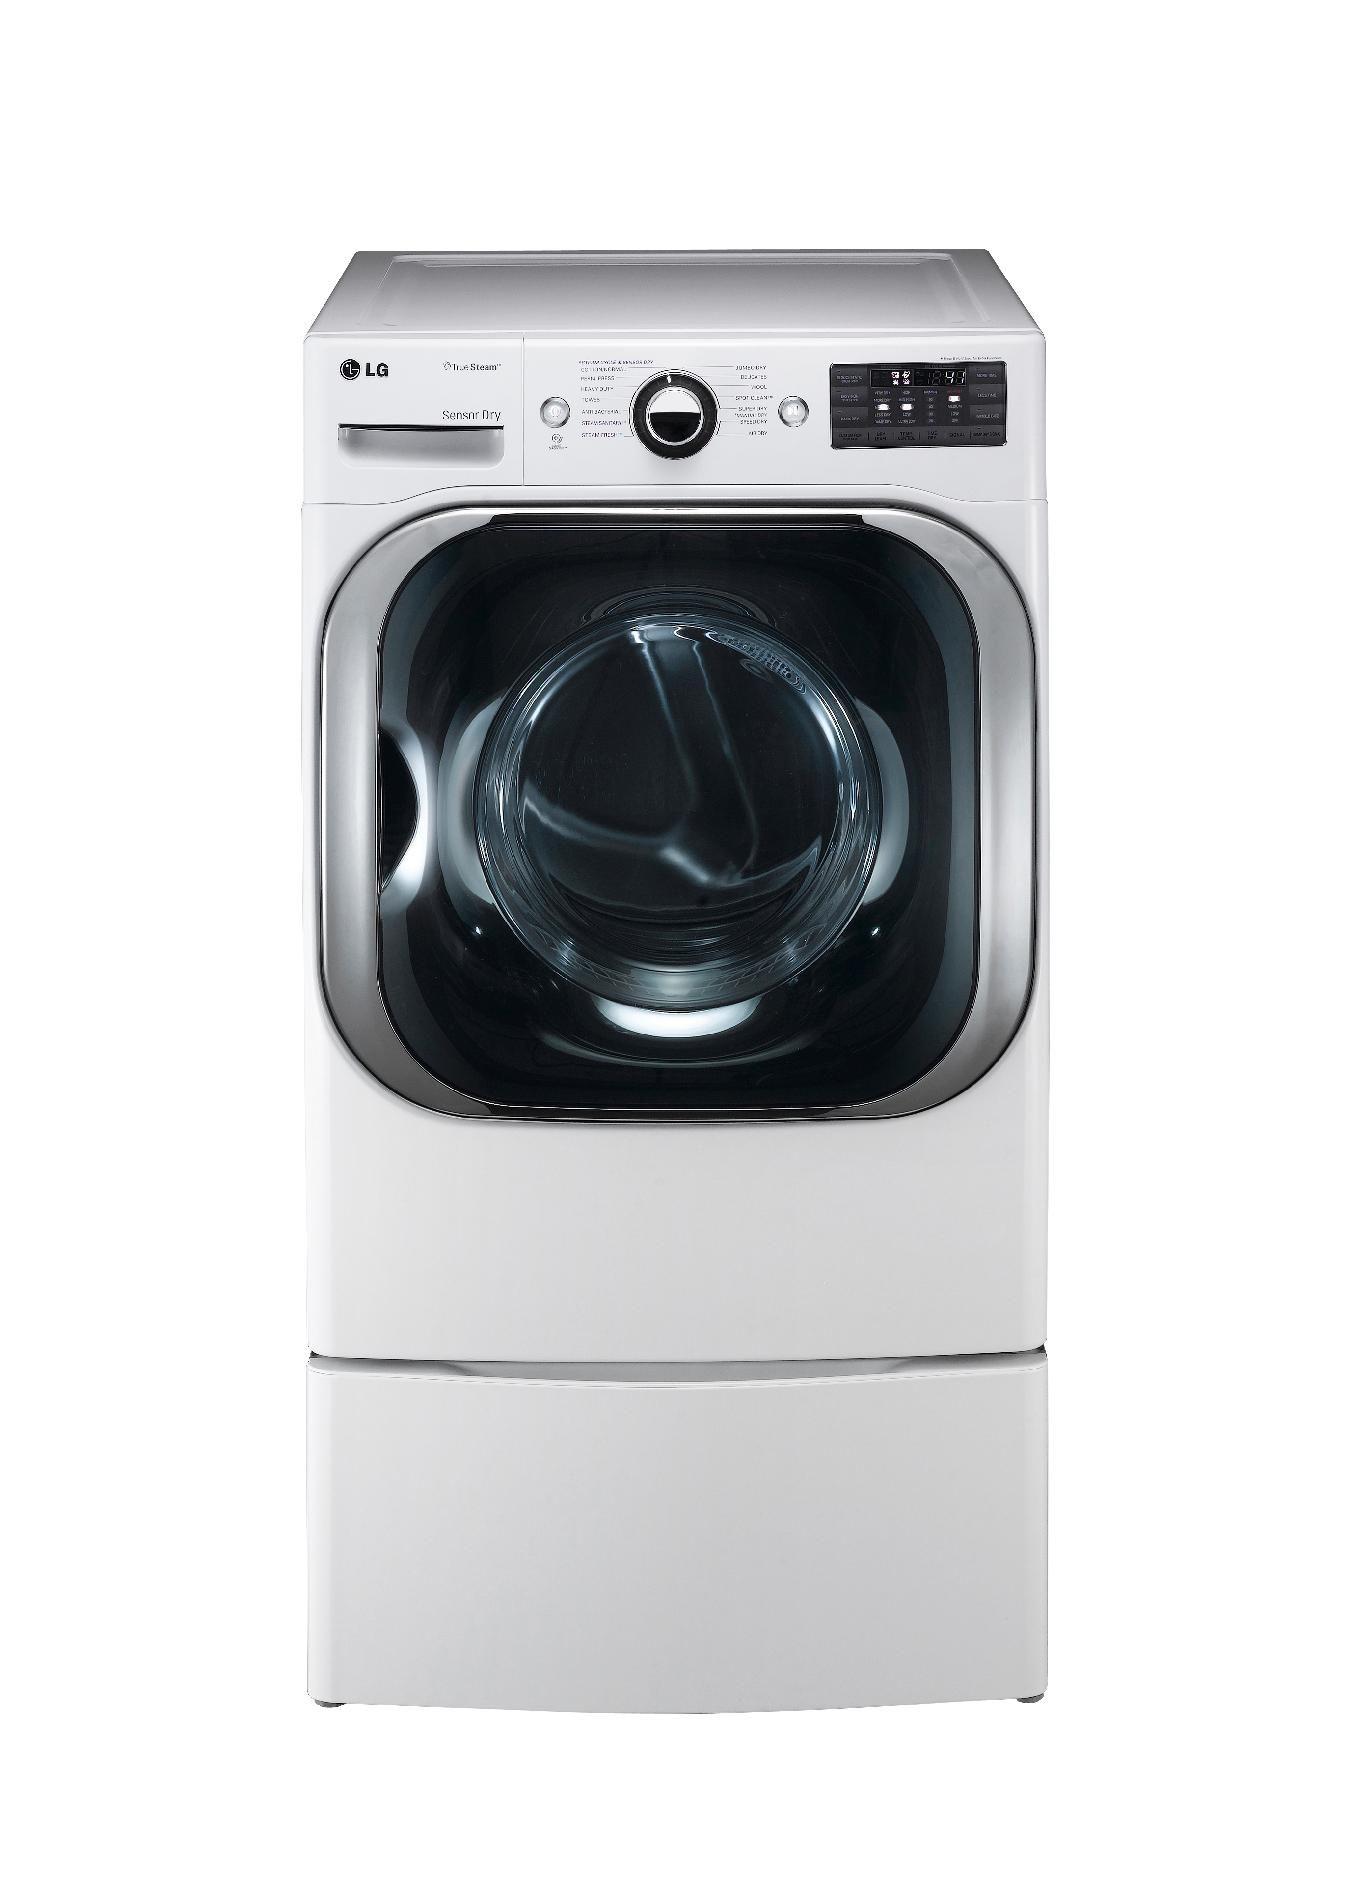 LG 9.0 cu. ft. Mega-Capacity Steam  Gas Dryer - White